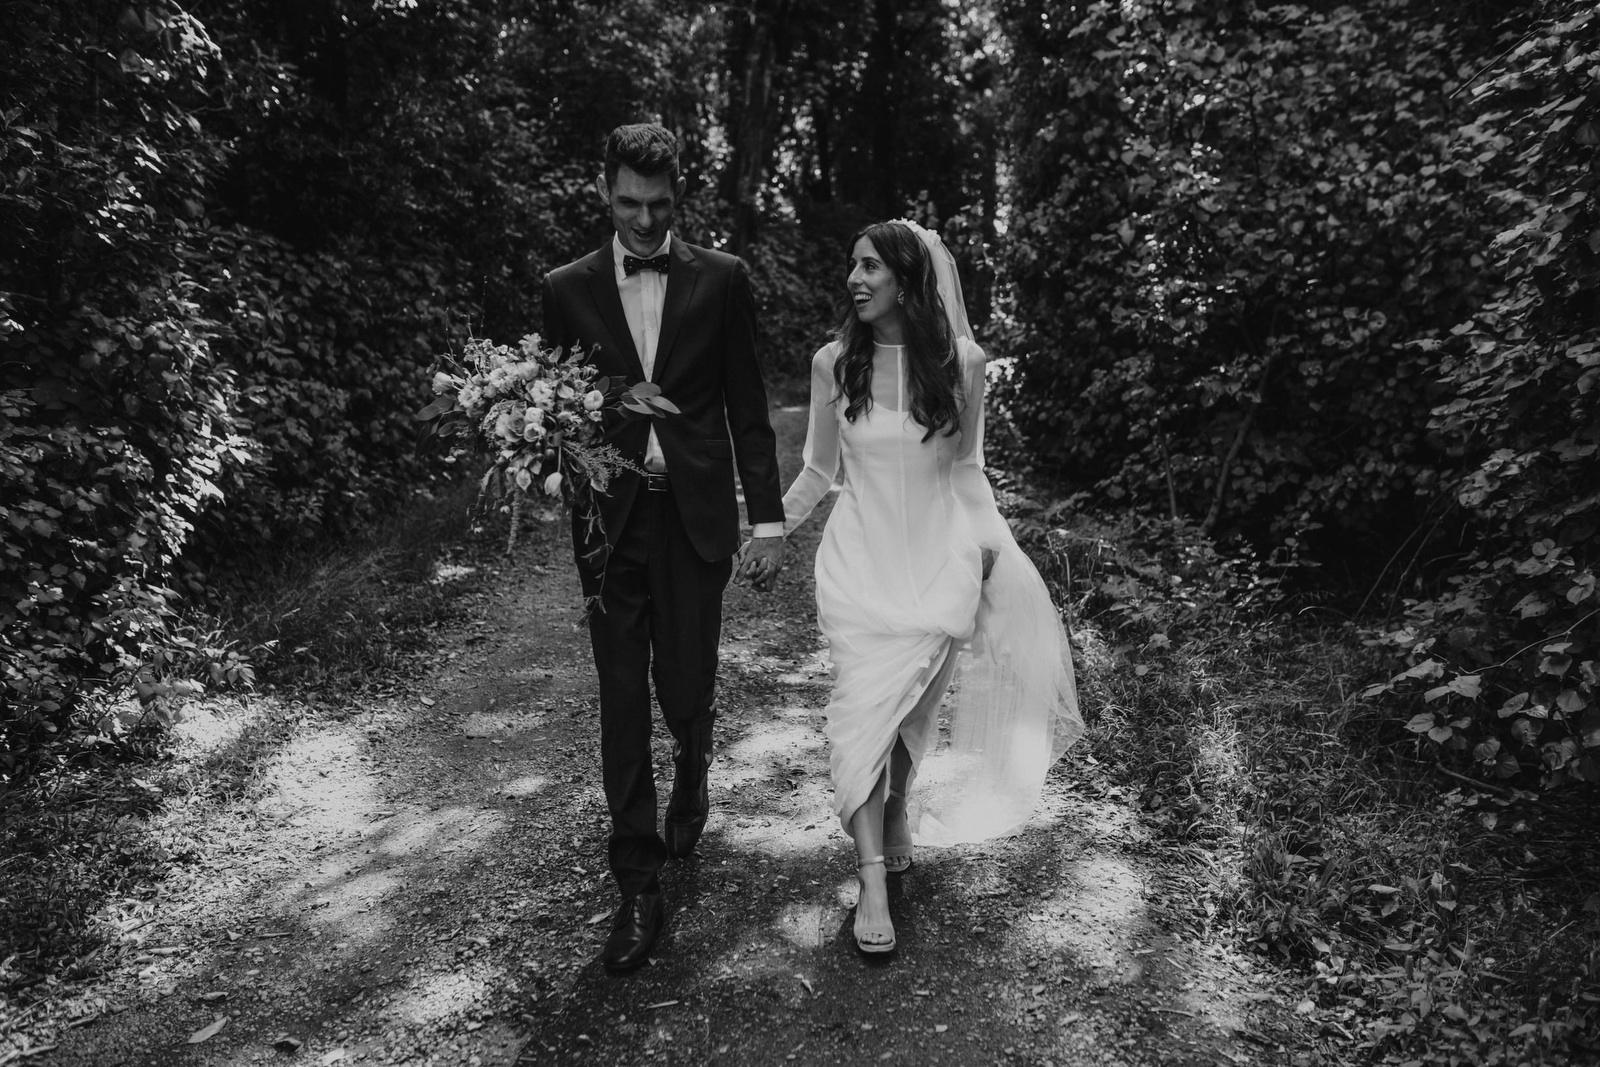 wedding-venue-Rose&Smith-23.JPG